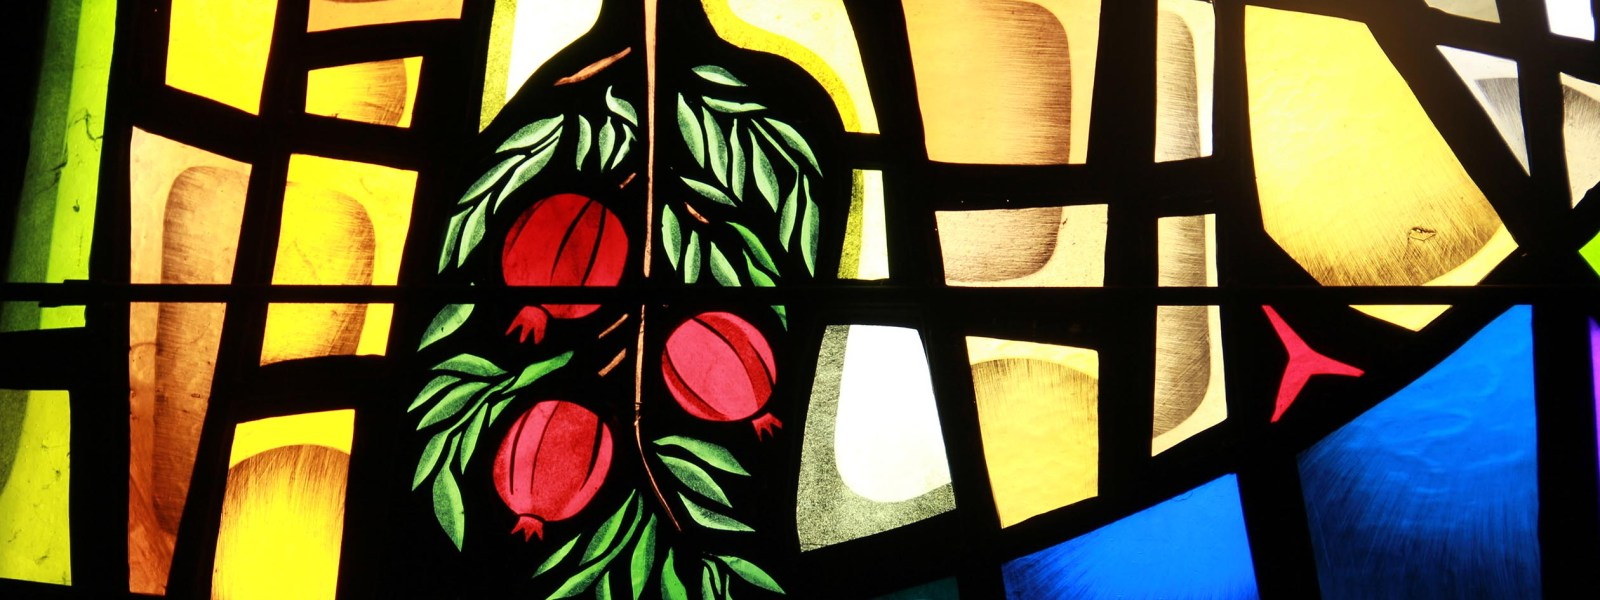 September 20 Online Worship Service